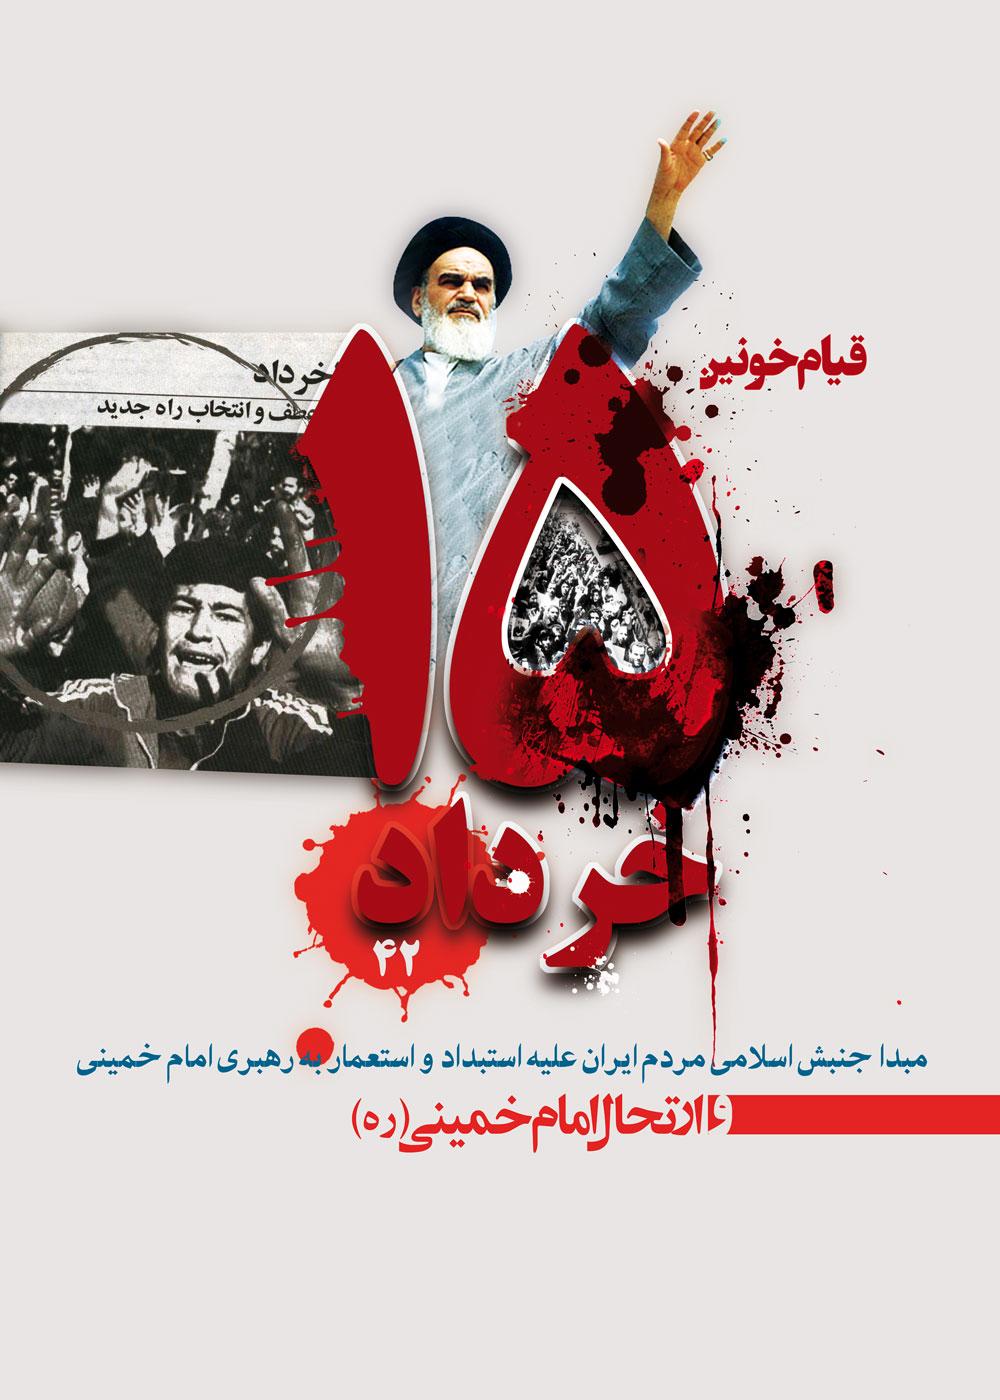 http://www.askquran.ir/gallery/images/60/1___15__20110524_1439873291.jpg